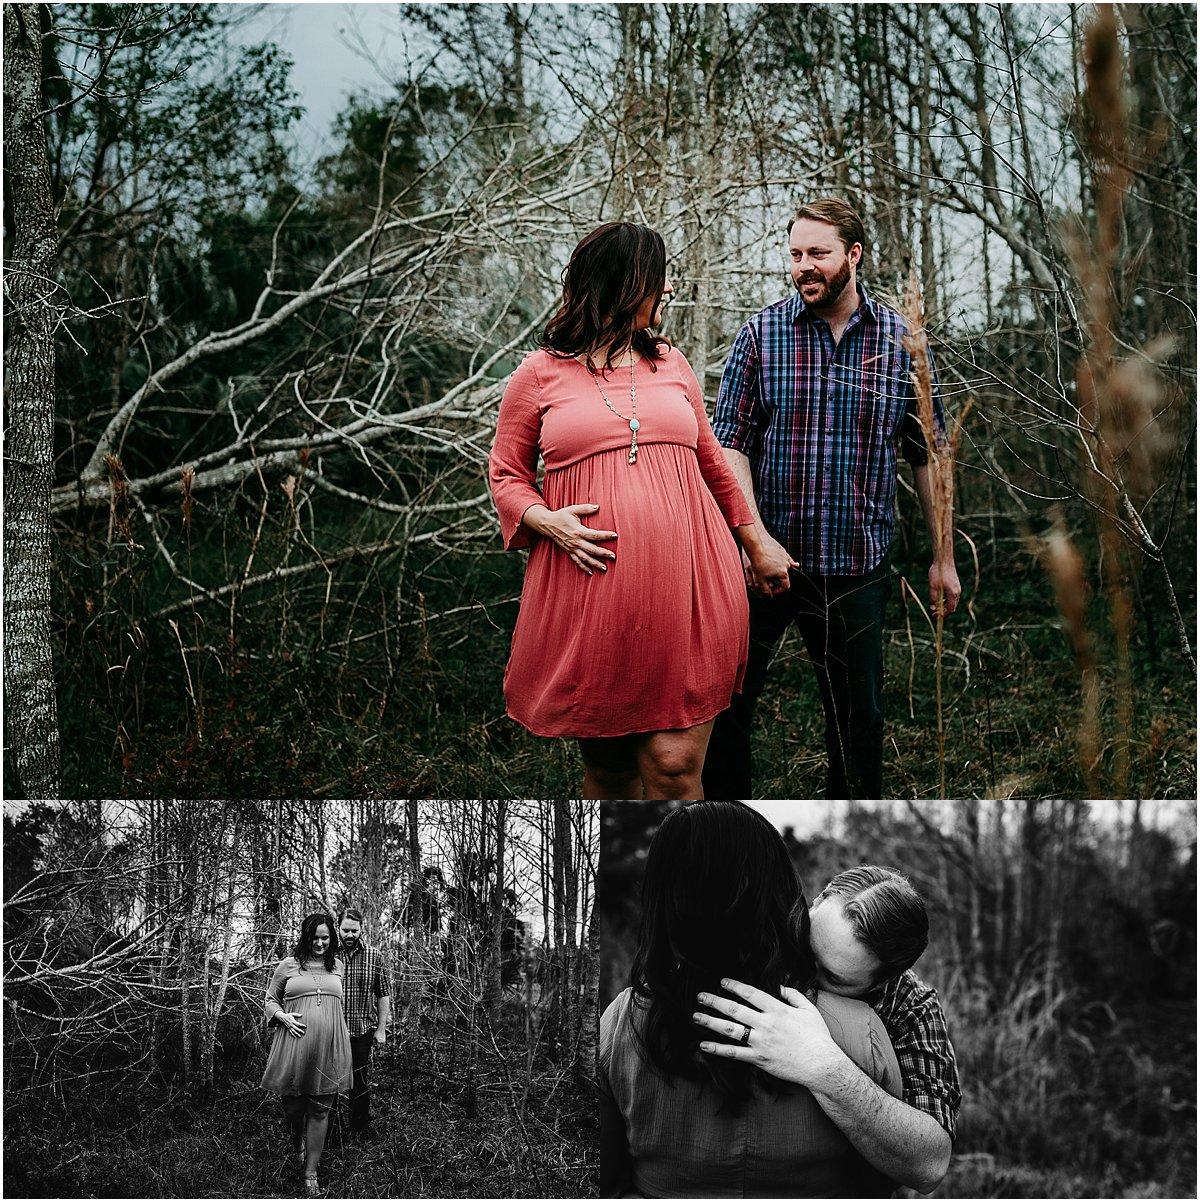 Ashley_Rogers_Photography_Orlando_Non-Posed_Newborn_Family_Lifestyle_Photographer_0341.jpg